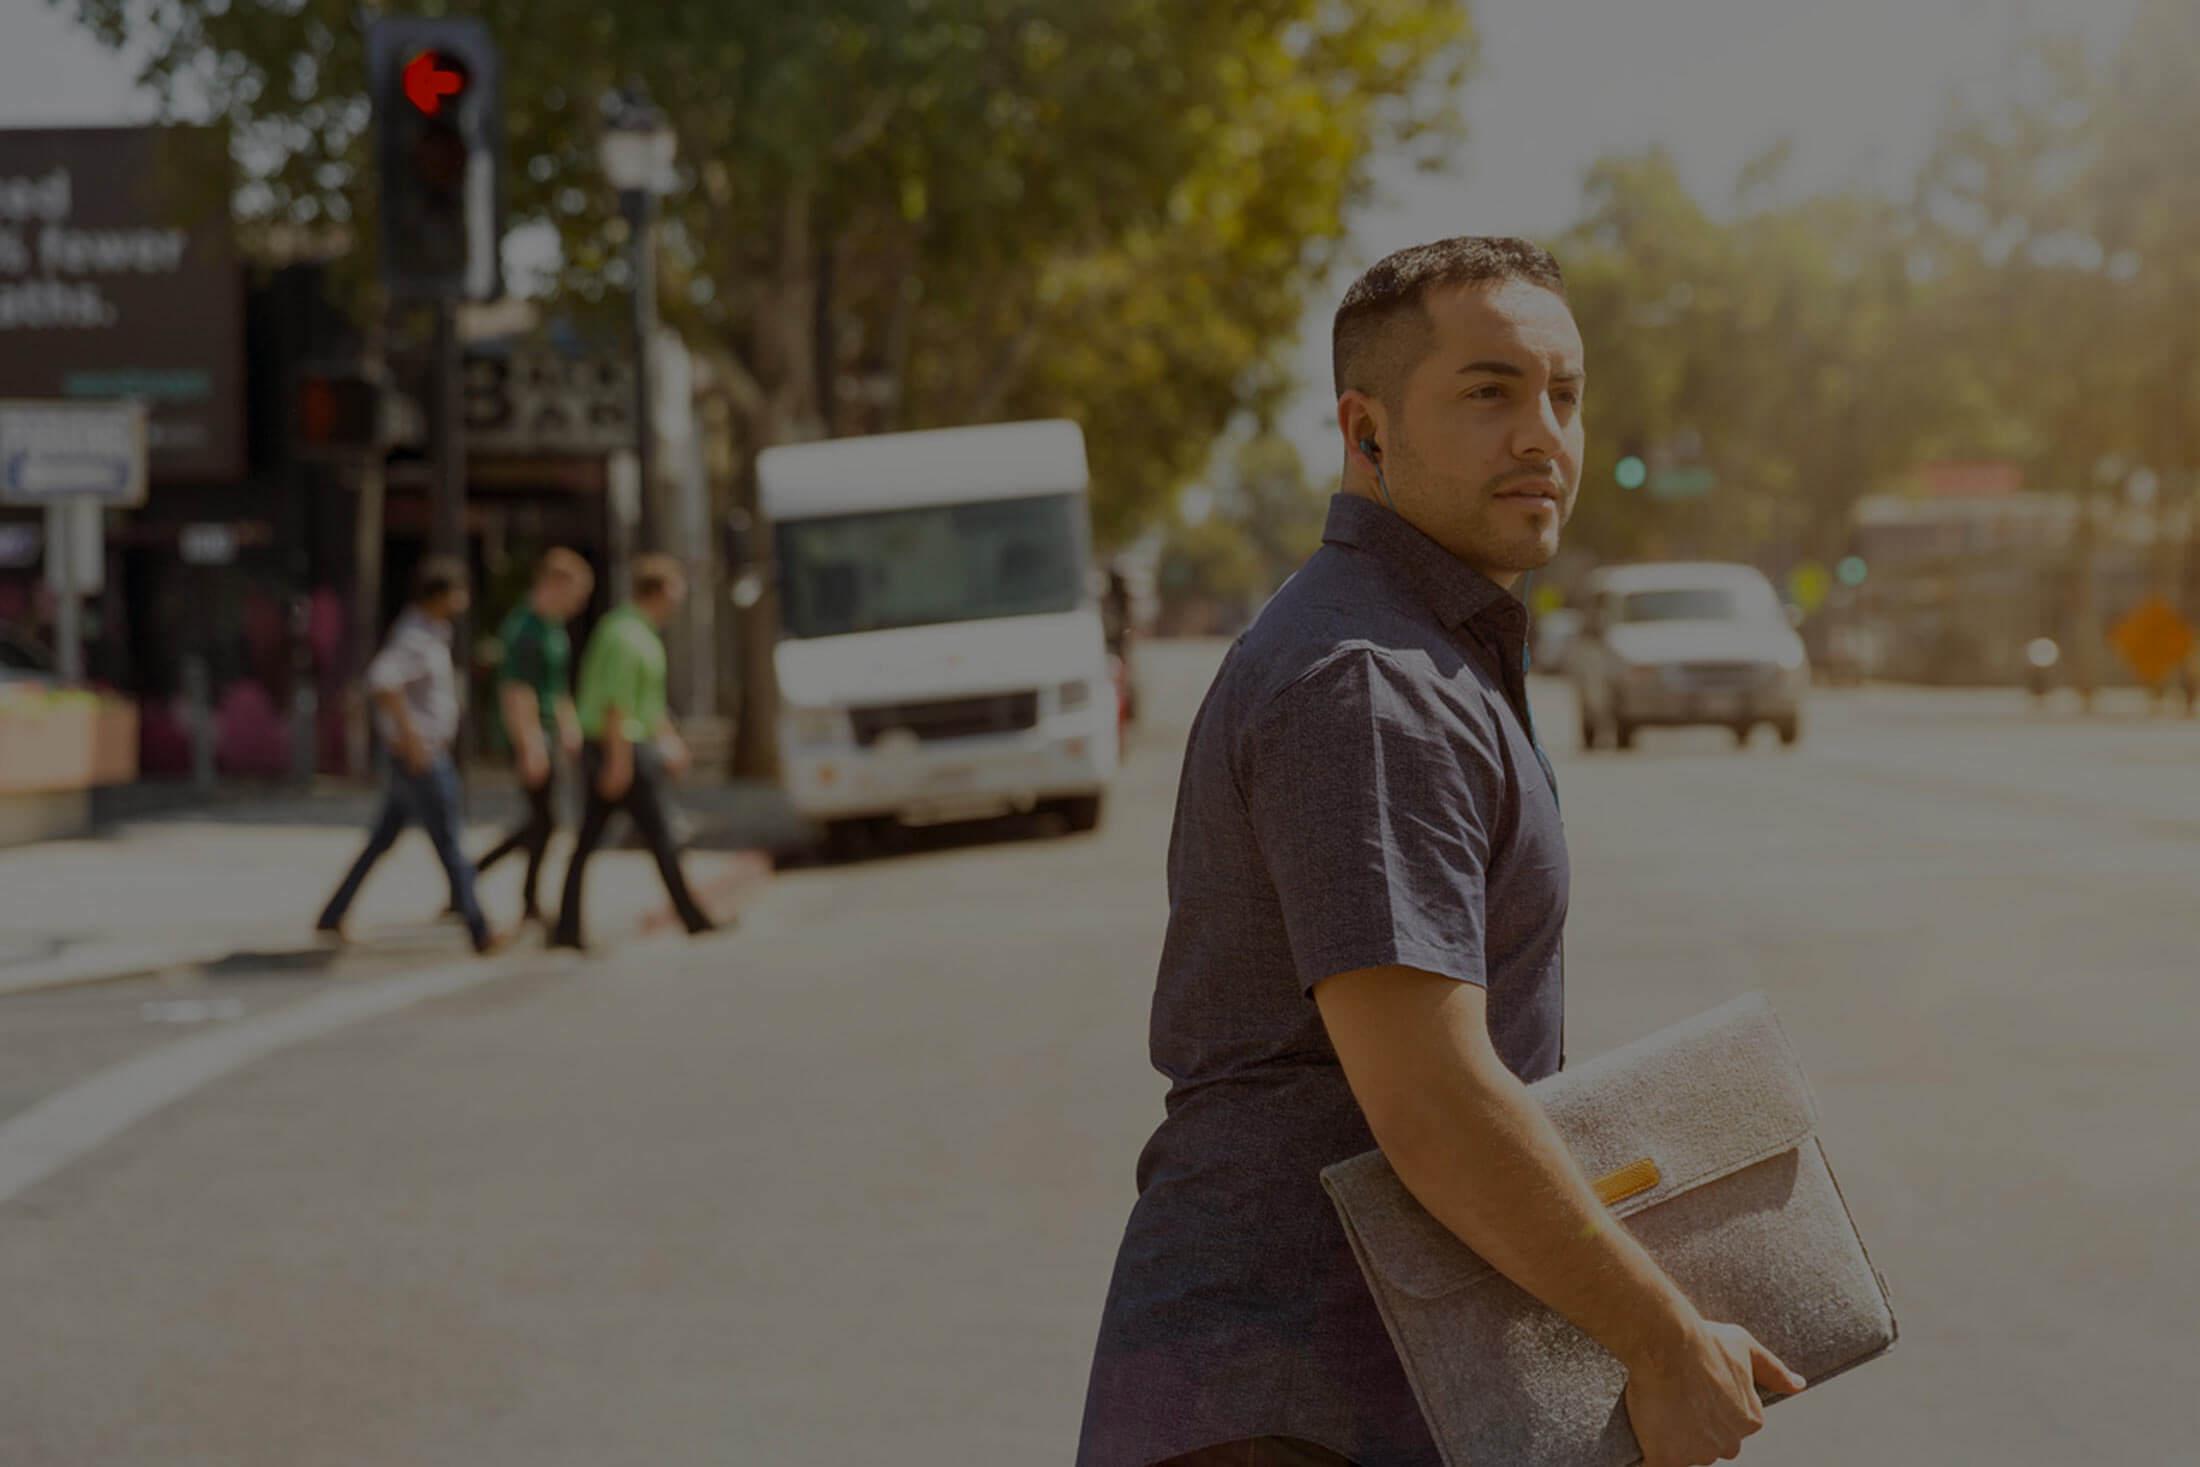 Pole emploi - offre emploi Cuisinier collectivite la ciotat (H/F) - La Ciotat